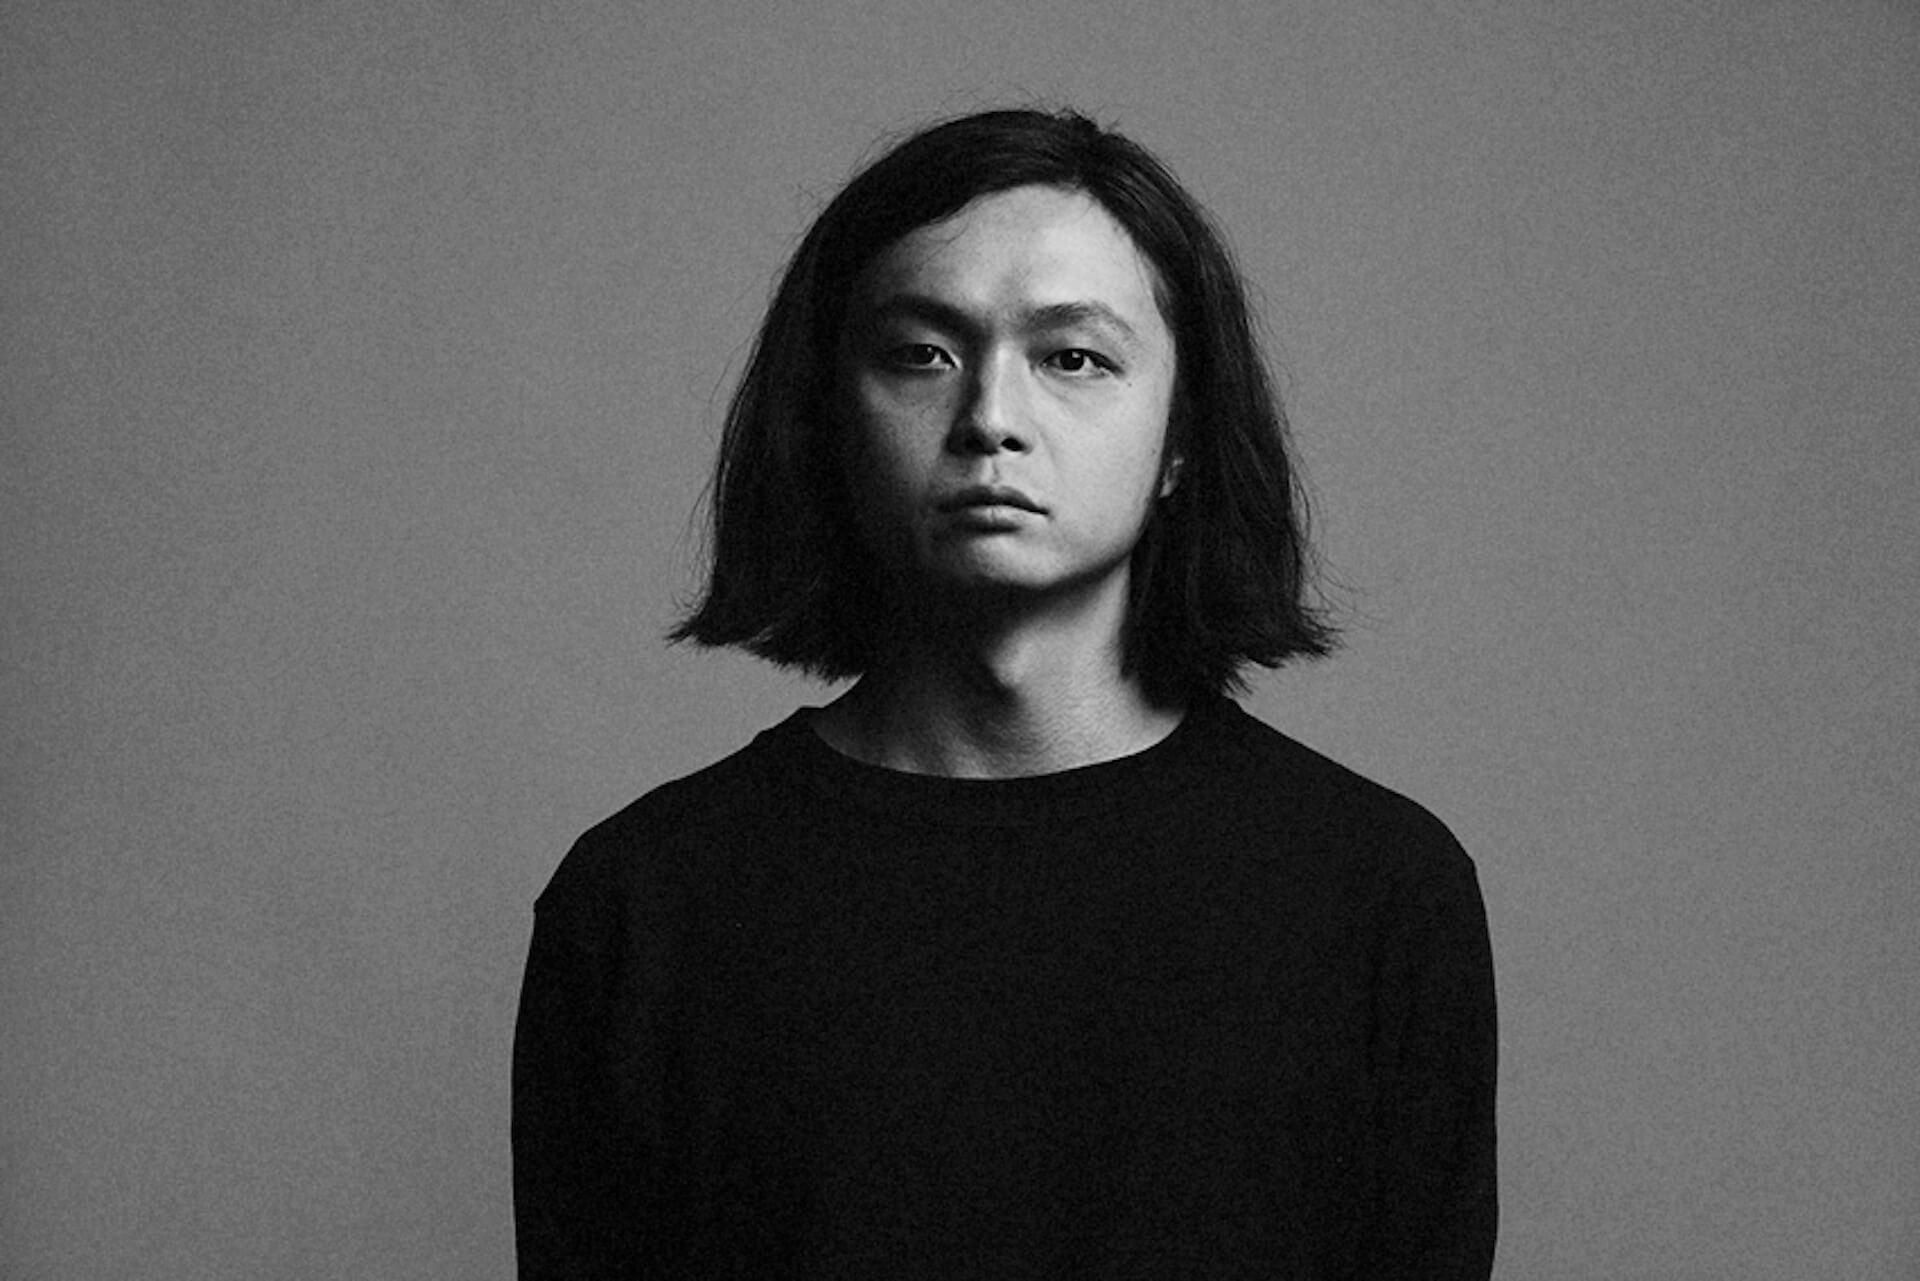 Mika Vainioのトリビュート・イベントがRyoji Ikeda発案の元、WWW Xにて開催|cyclo.が8年ぶりの東京公演、行松陽介、HarukaらがDJで出演 music190830-mika-vainio-tribute-2